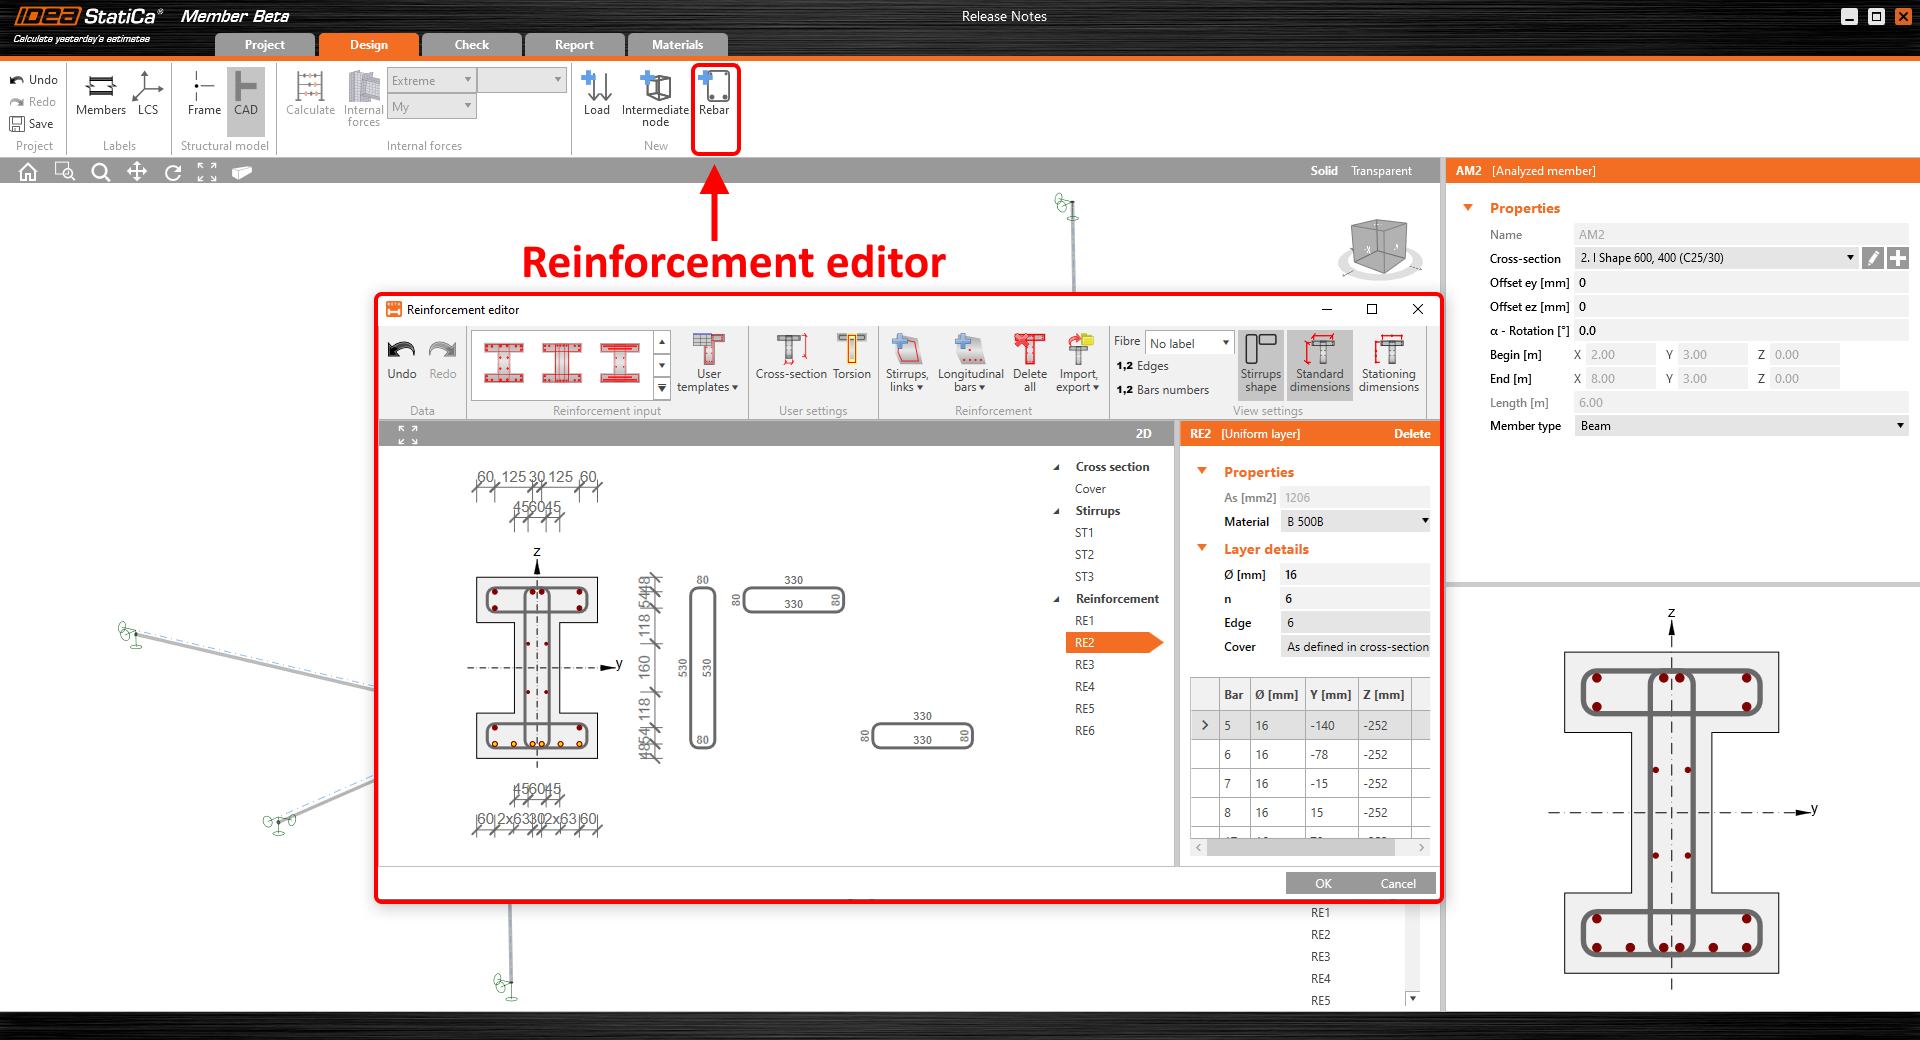 IDEA StatiCa - Reinforcement editor